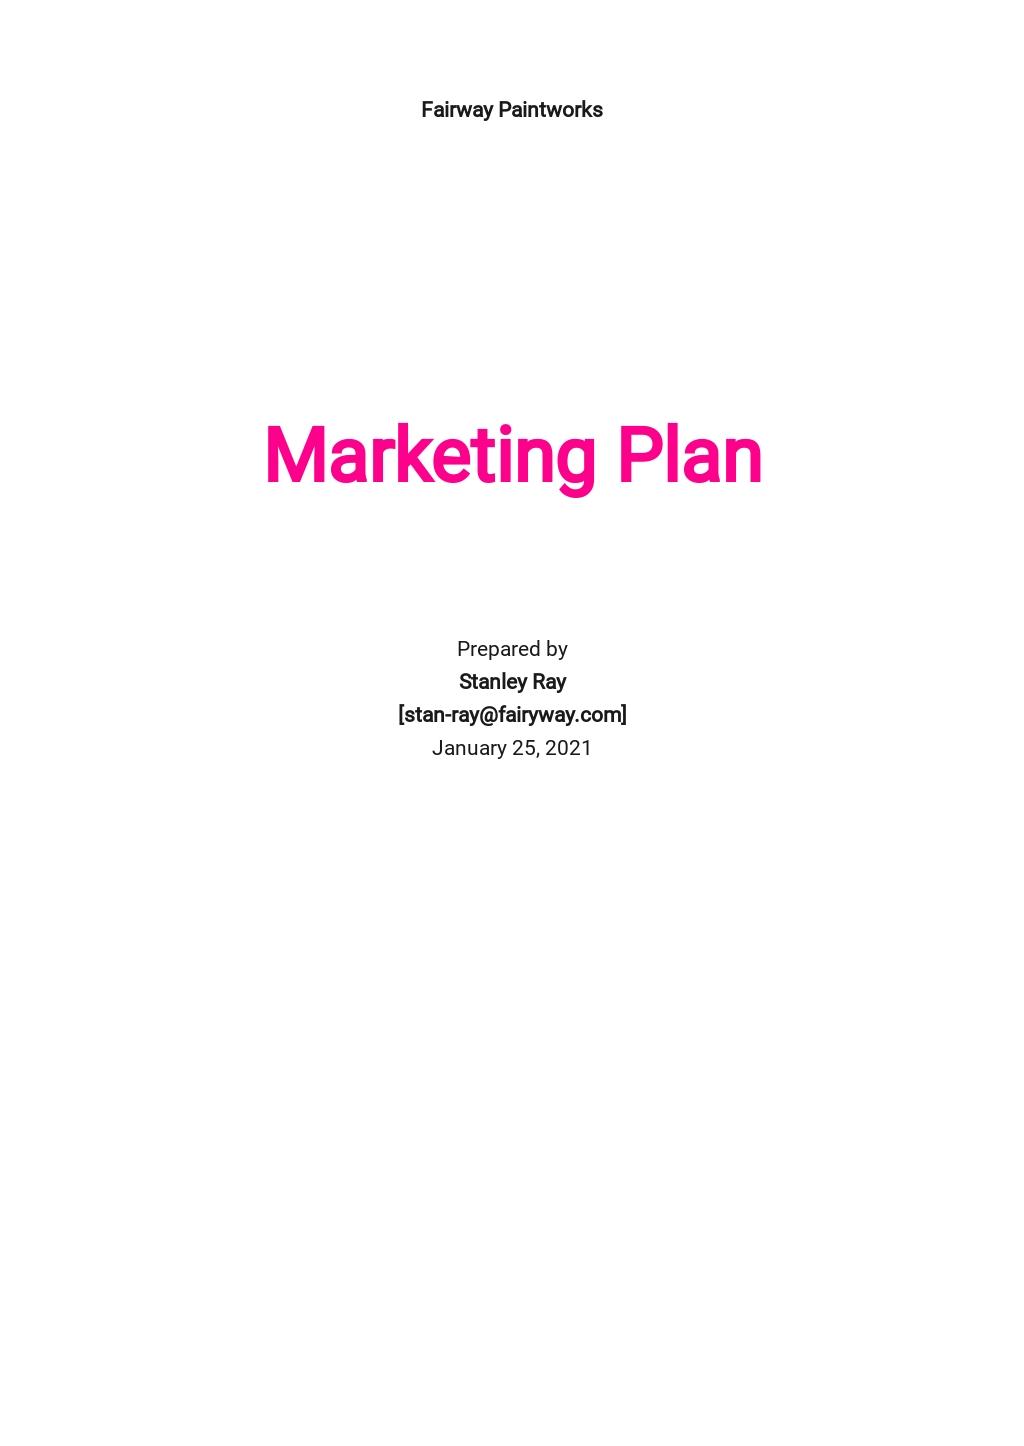 Painting Company Marketing Plan Template